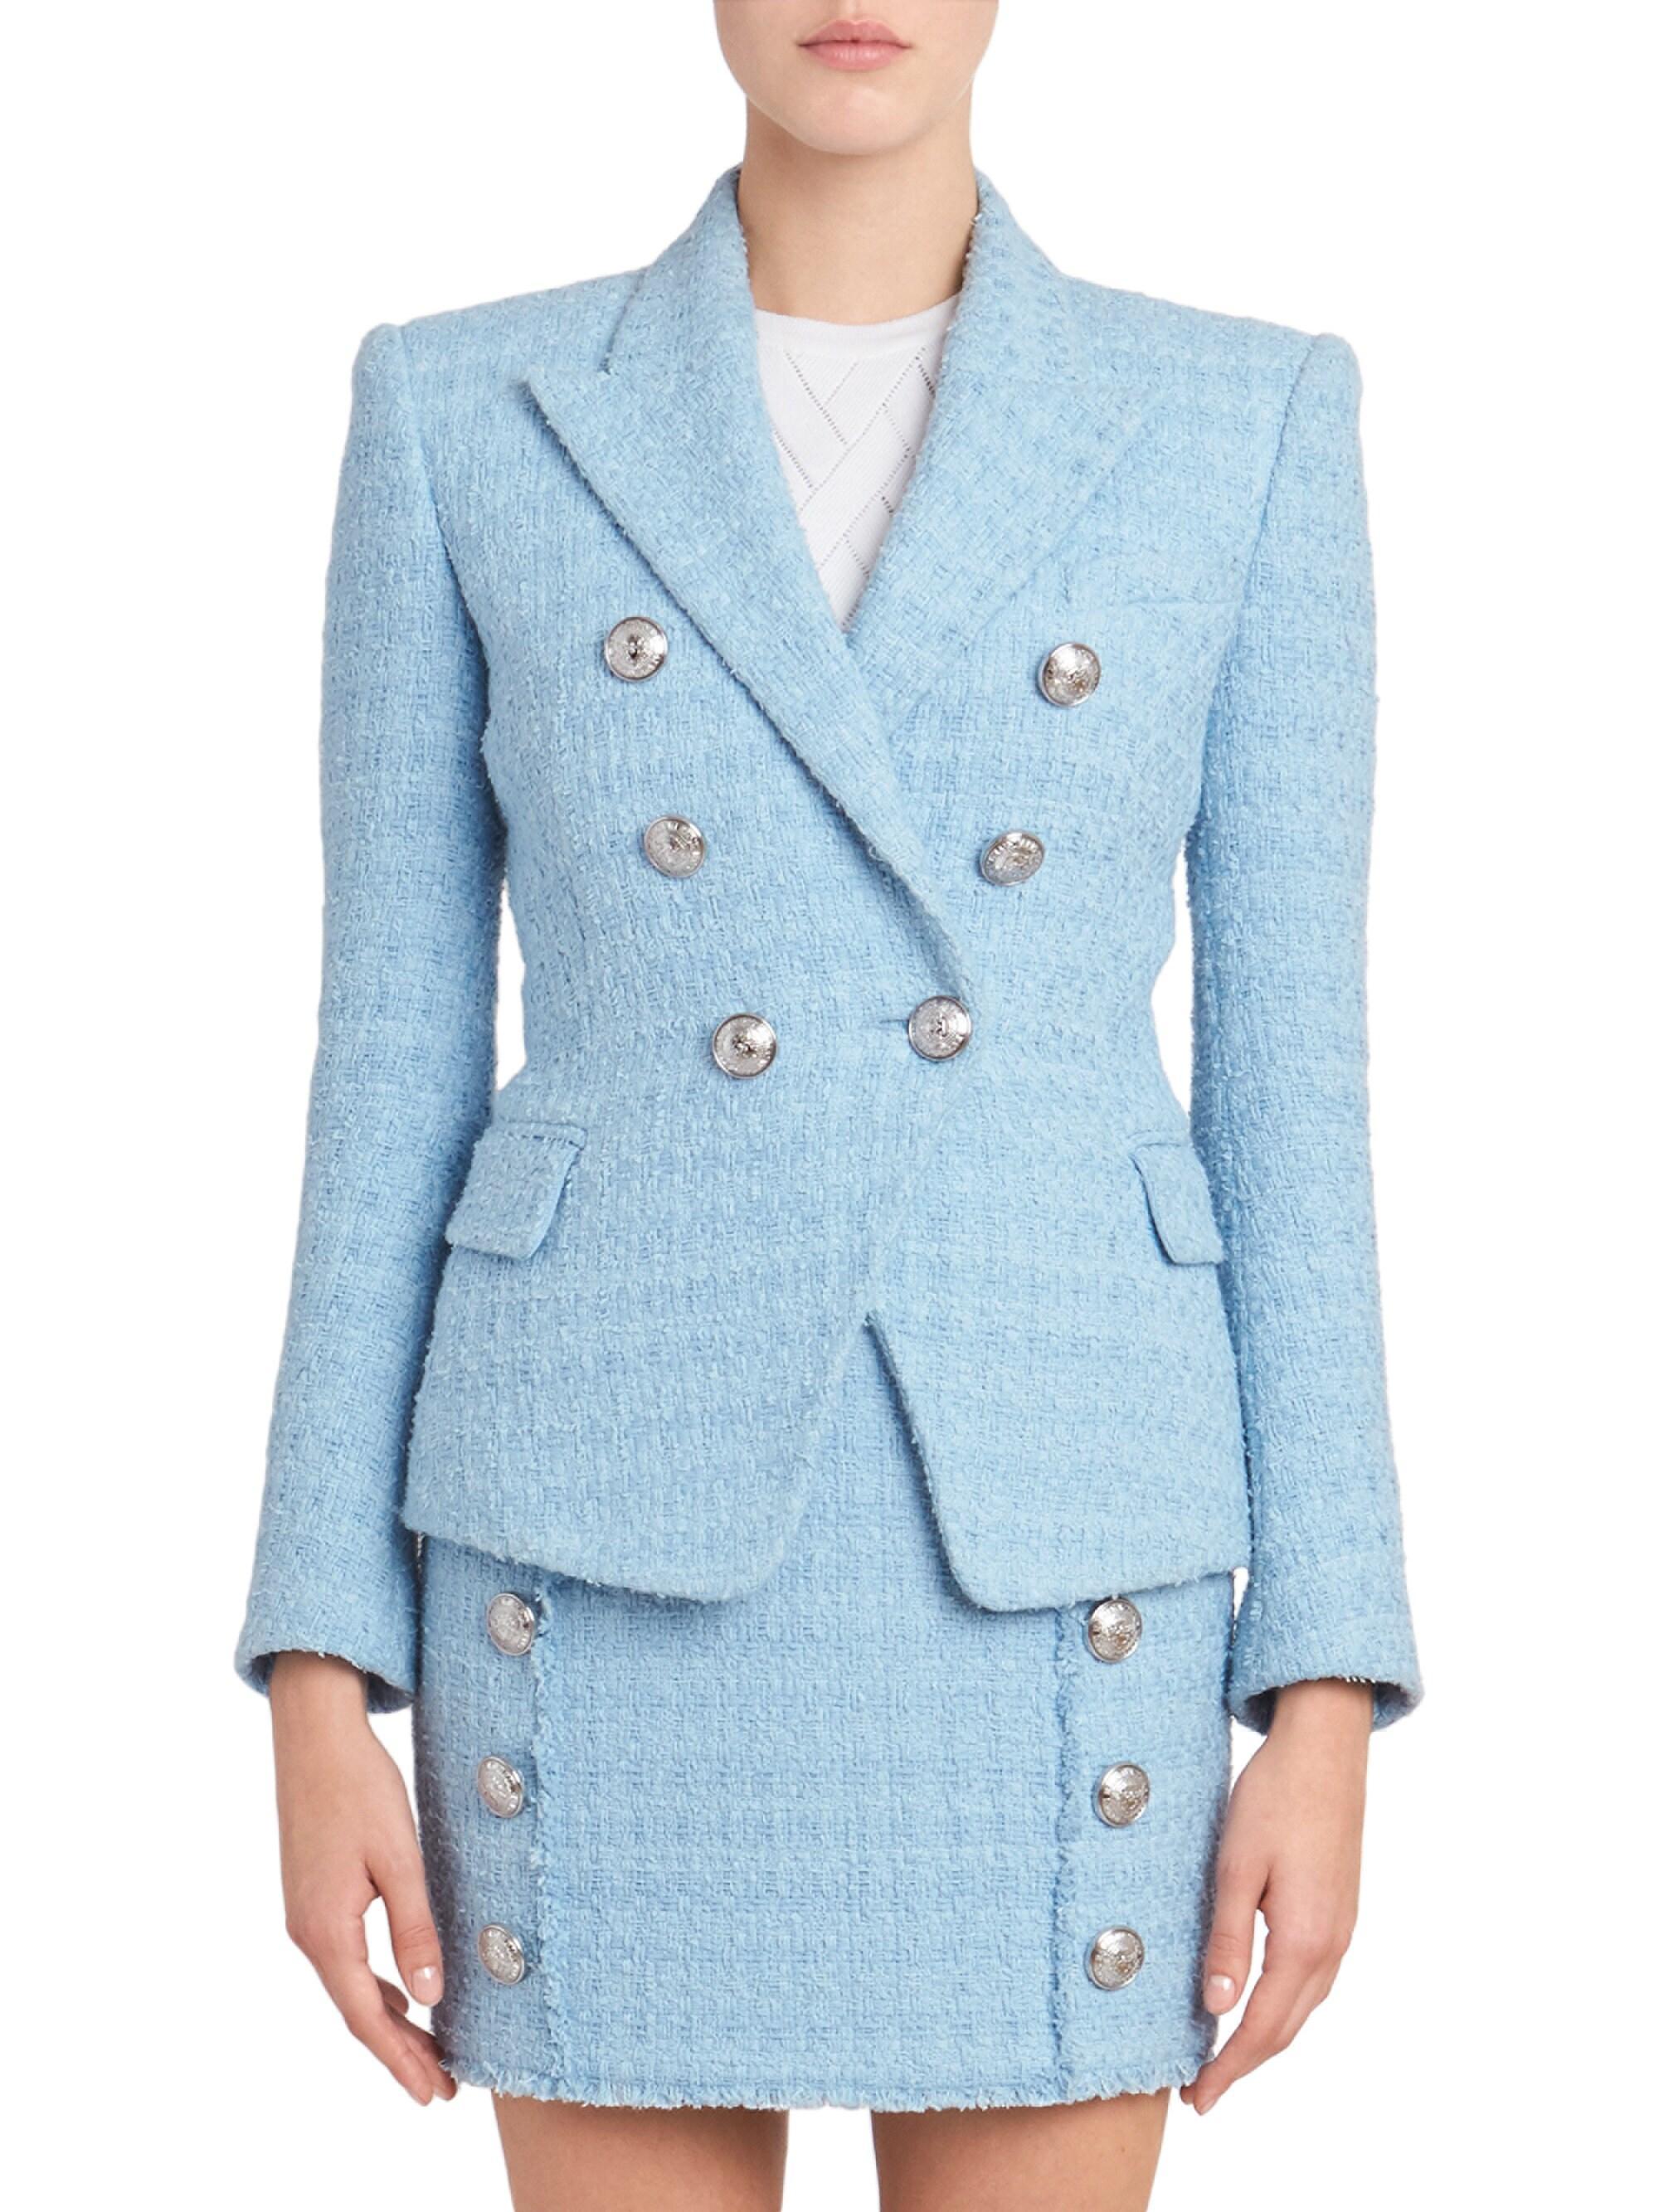 Balmain Womens Six-button Tweed Jacket - Pastel Blue in